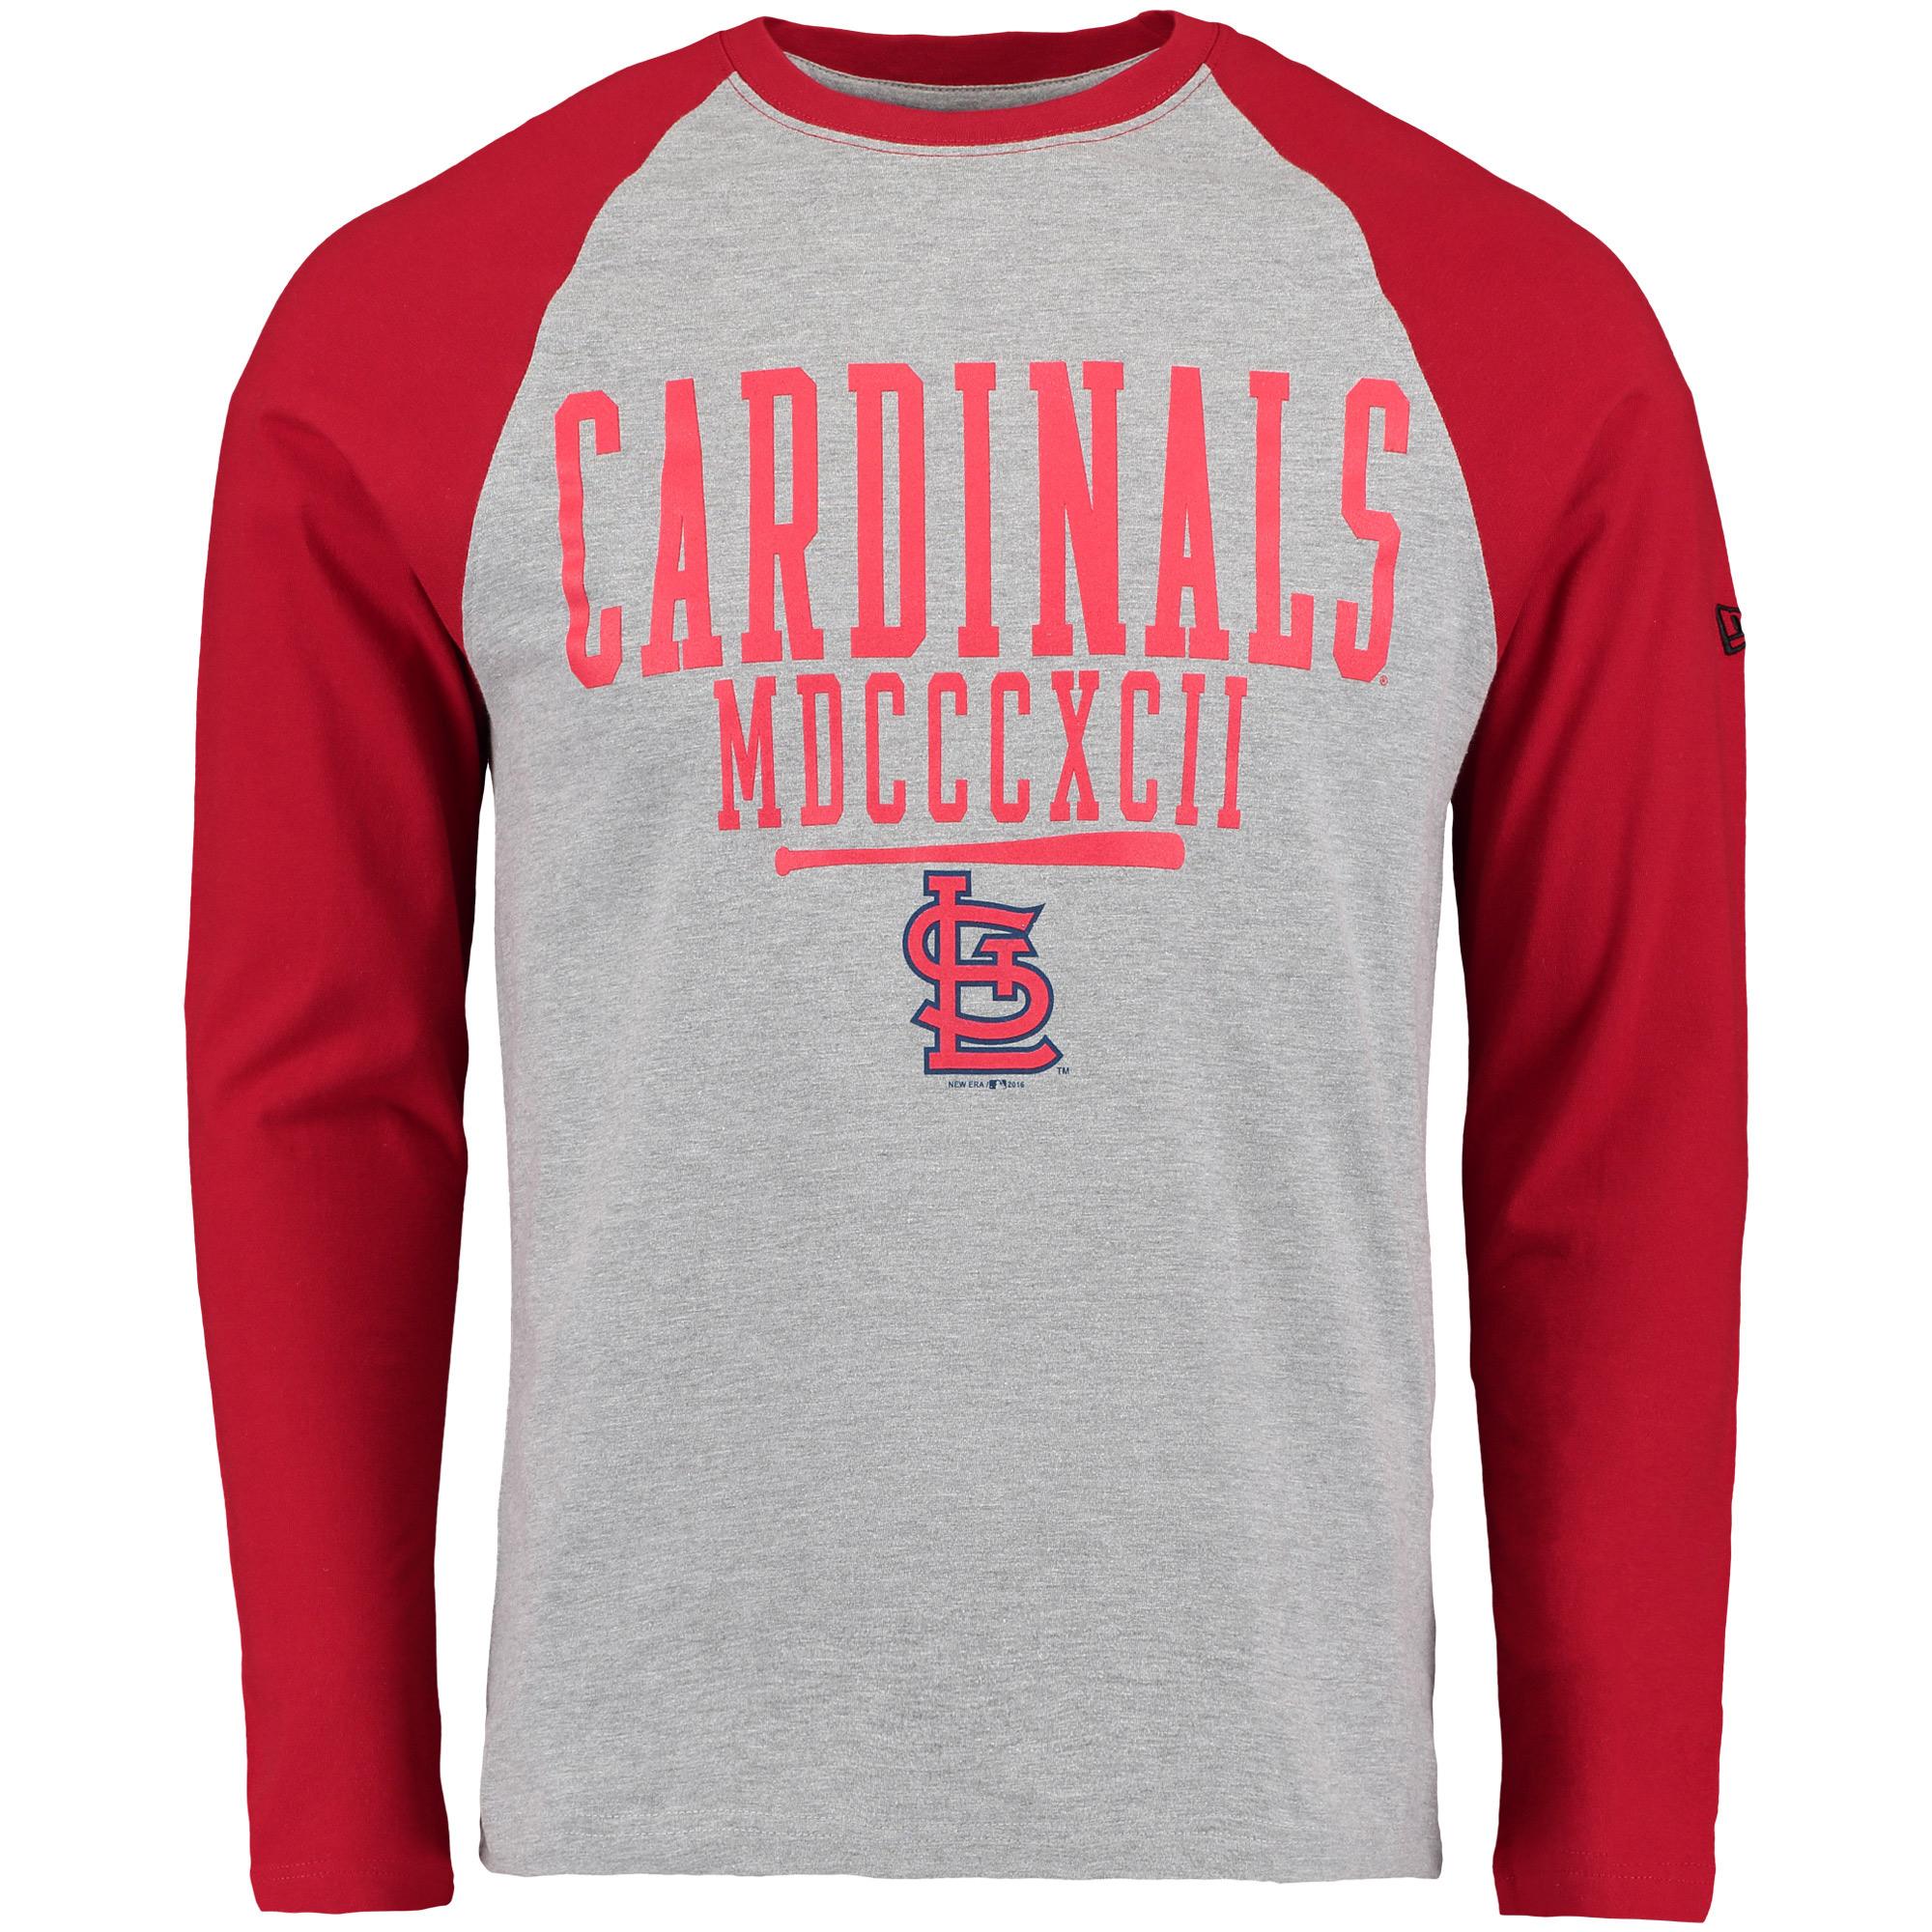 St. Louis Cardinals New Era Roman Numeral Long Sleeve Raglan T-Shirt - Heathered Gray/Red